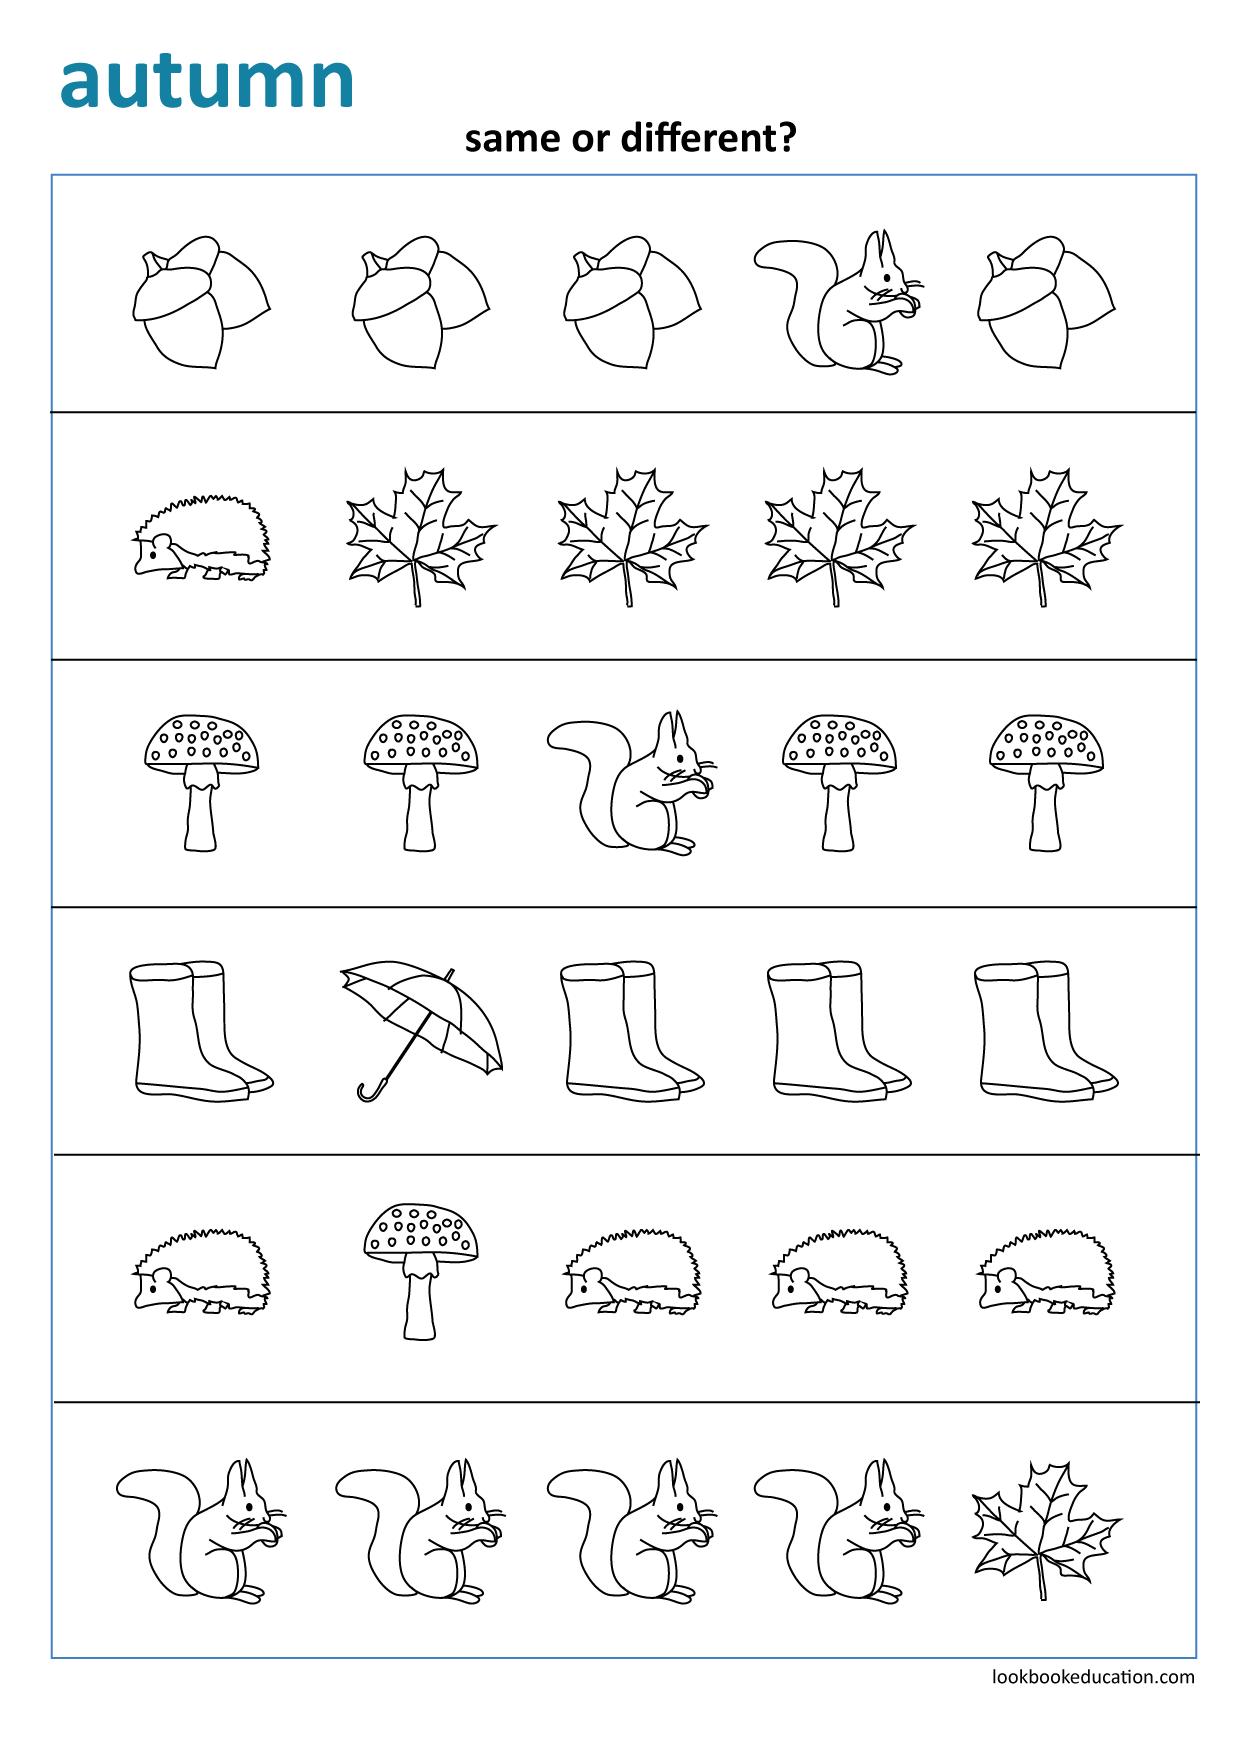 Same Or Different Fall Autumn Worksheet Preschool Kindergarten And First Grade Workshee Fall Preschool Worksheets First Grade Worksheets Seasons Worksheets [ 1756 x 1242 Pixel ]